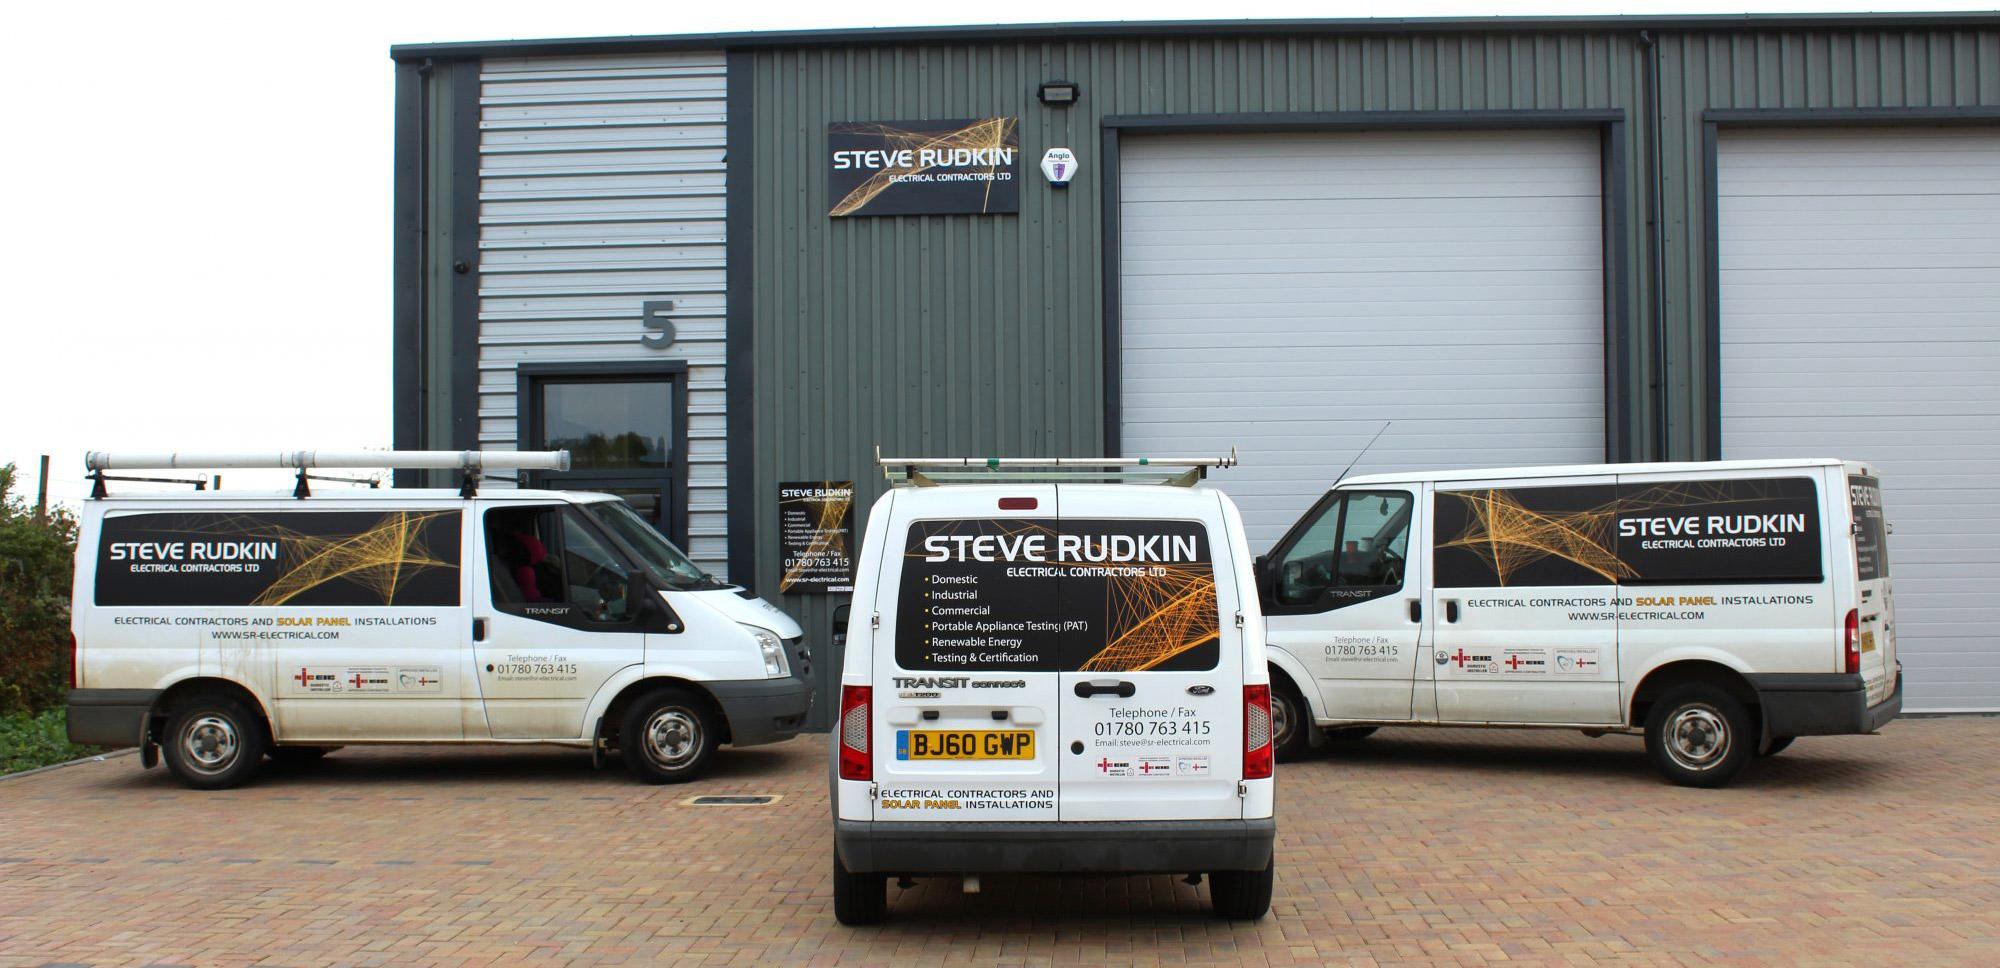 Steve Rudkin Electrical Contractors Ltd Casterton Offices